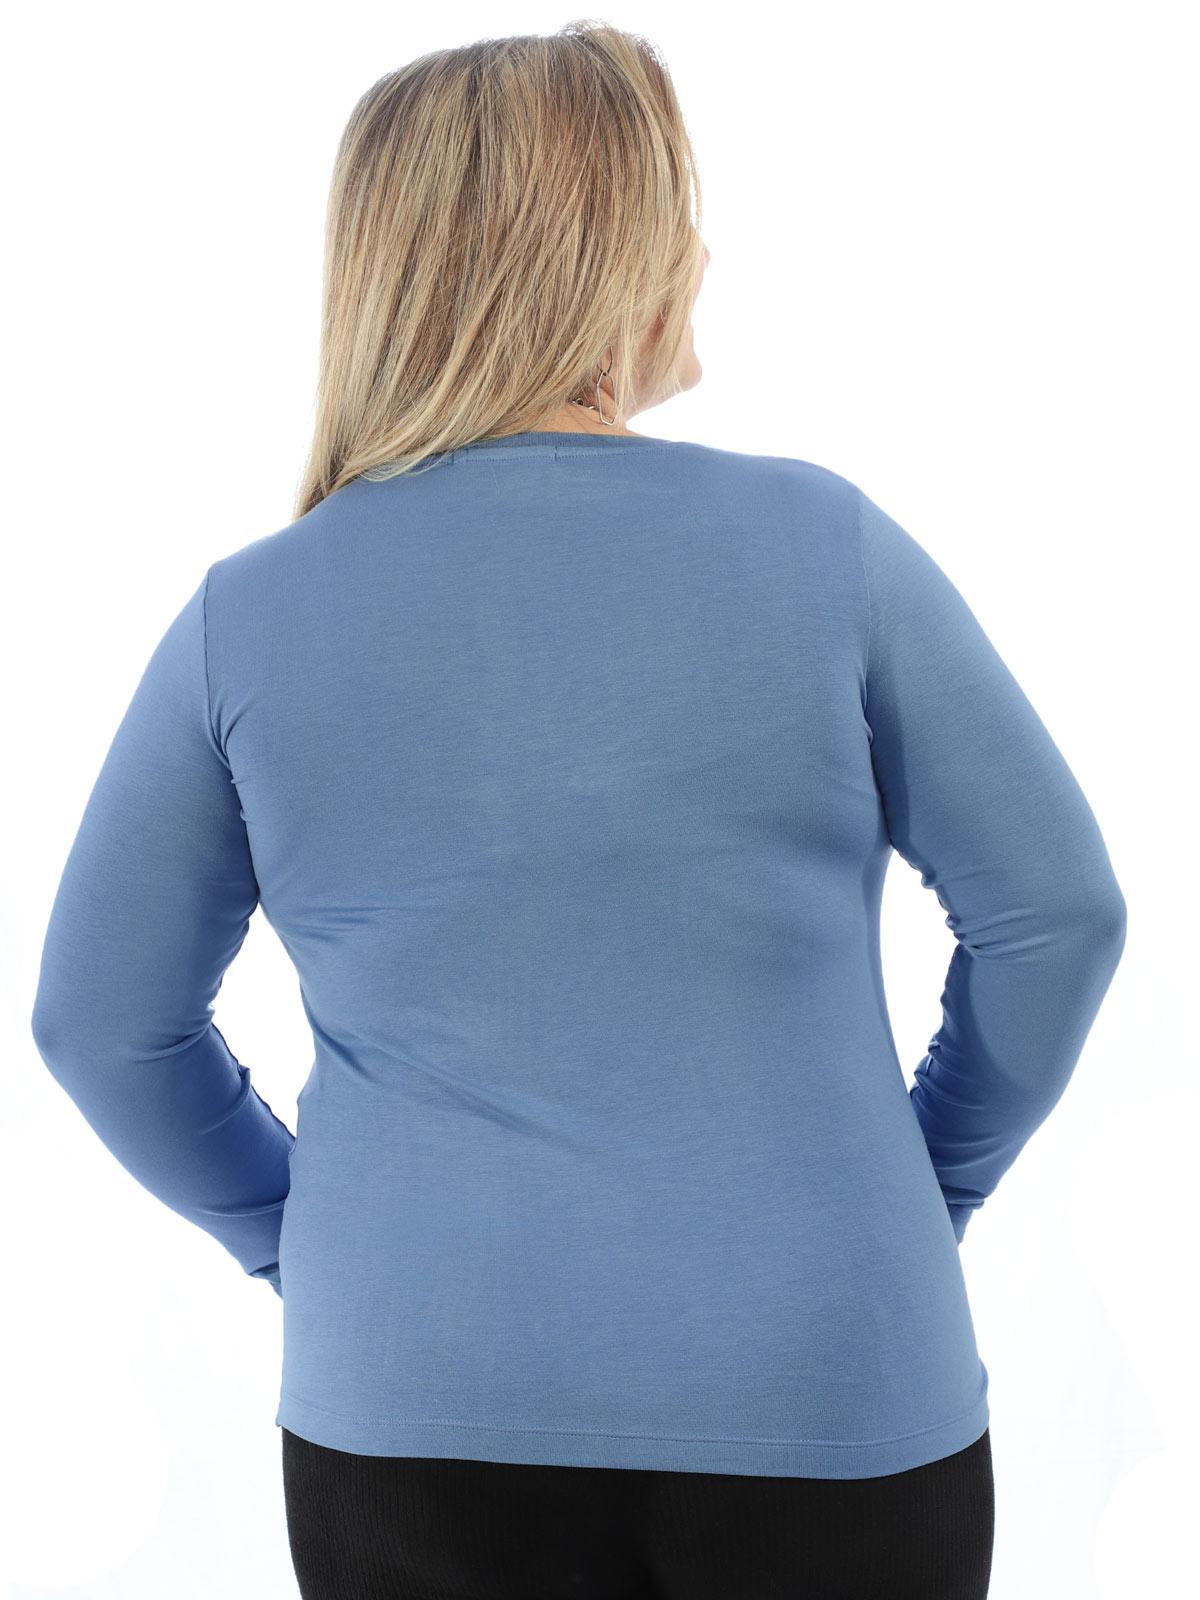 Blusa Feminina Plus Size Decote V. Manga Longa Azul